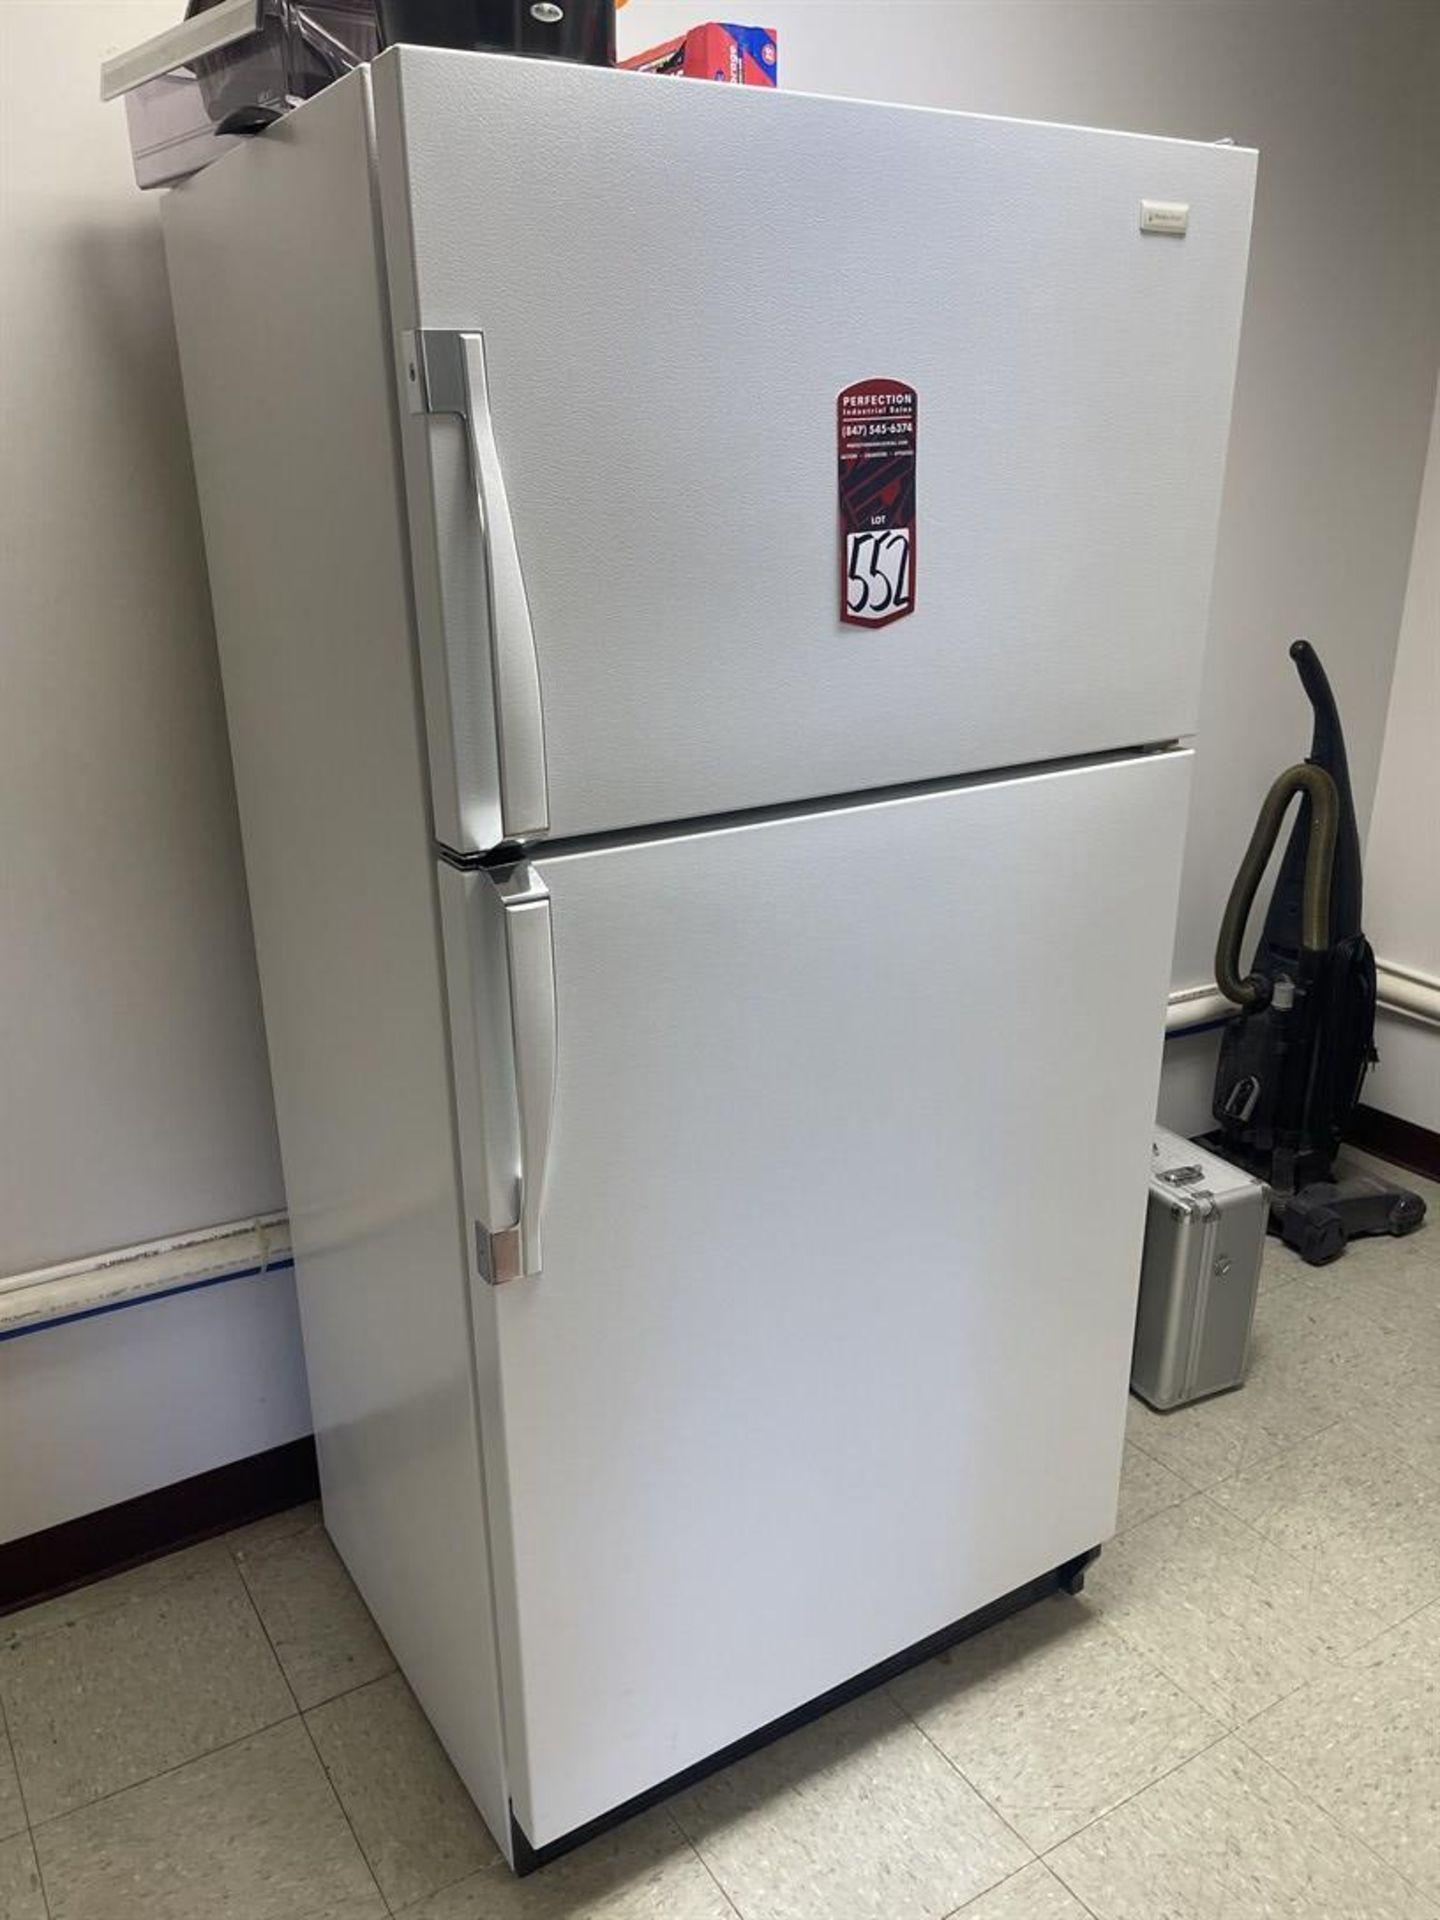 MAGIC CHEF Refrigerator/Freezer